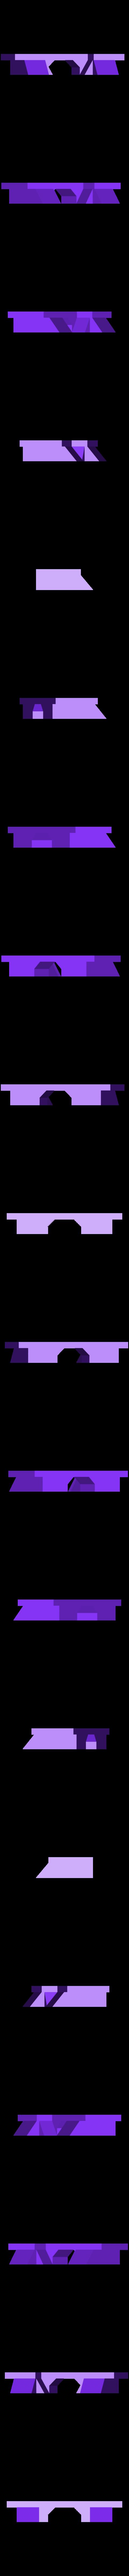 Wall_Organizer_Double_Stripes_-_Cleat.stl Download free STL file Wall Organizer • 3D printing object, 3DBROOKLYN